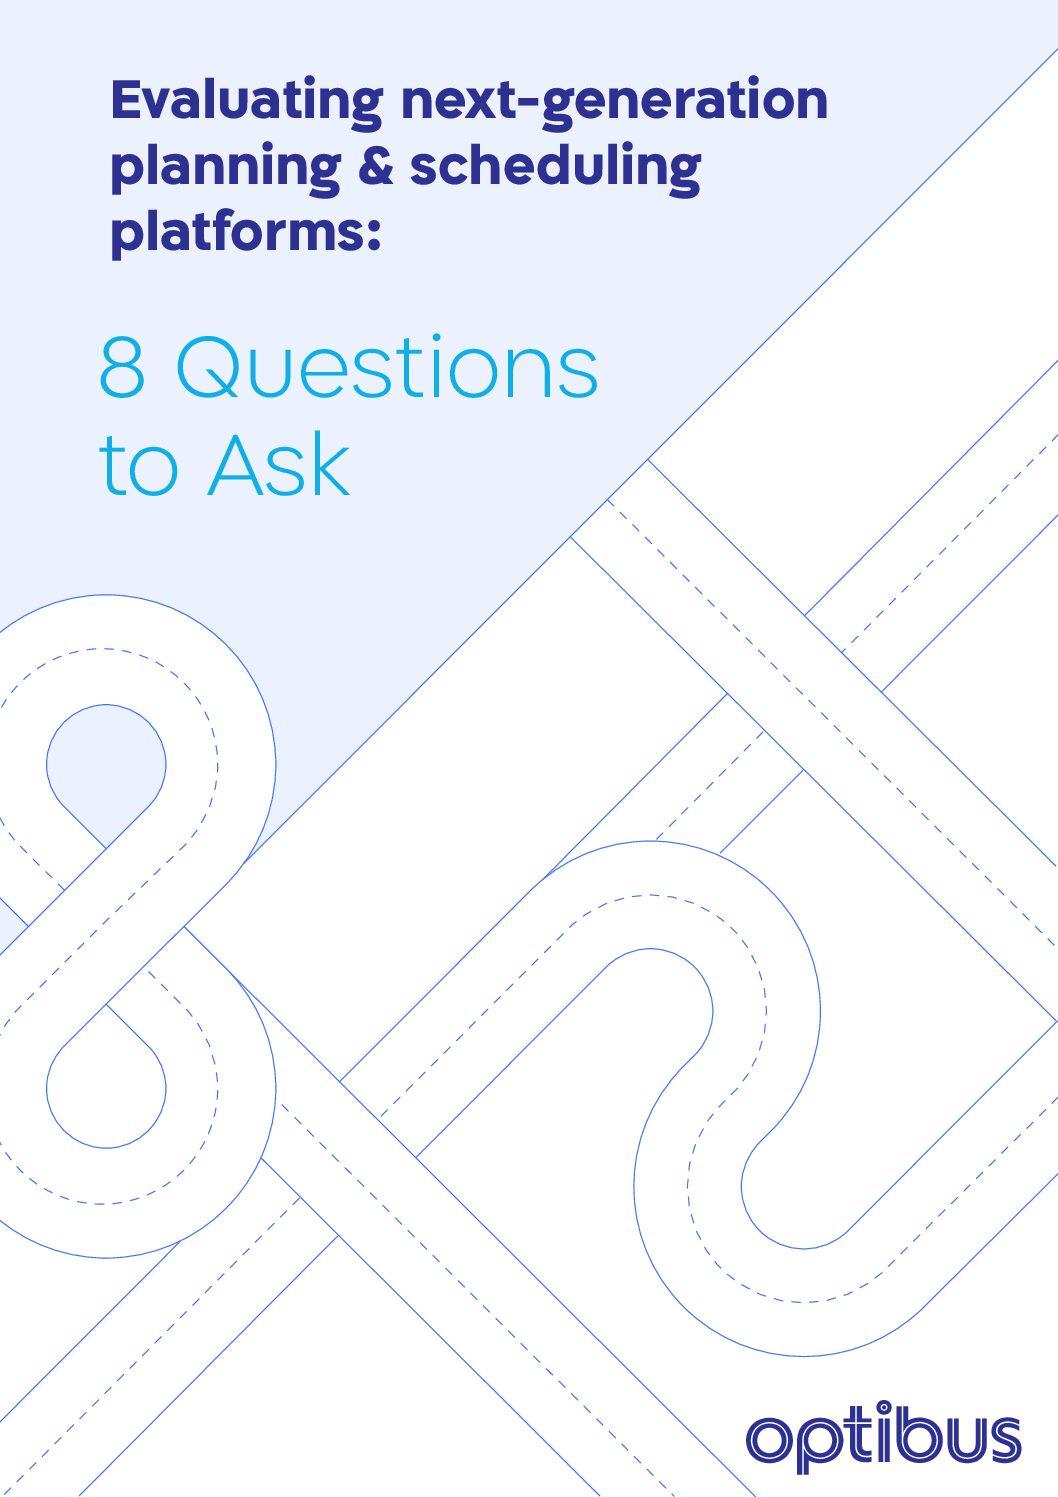 Evaluating Next-Generation Planning & Scheduling Platforms